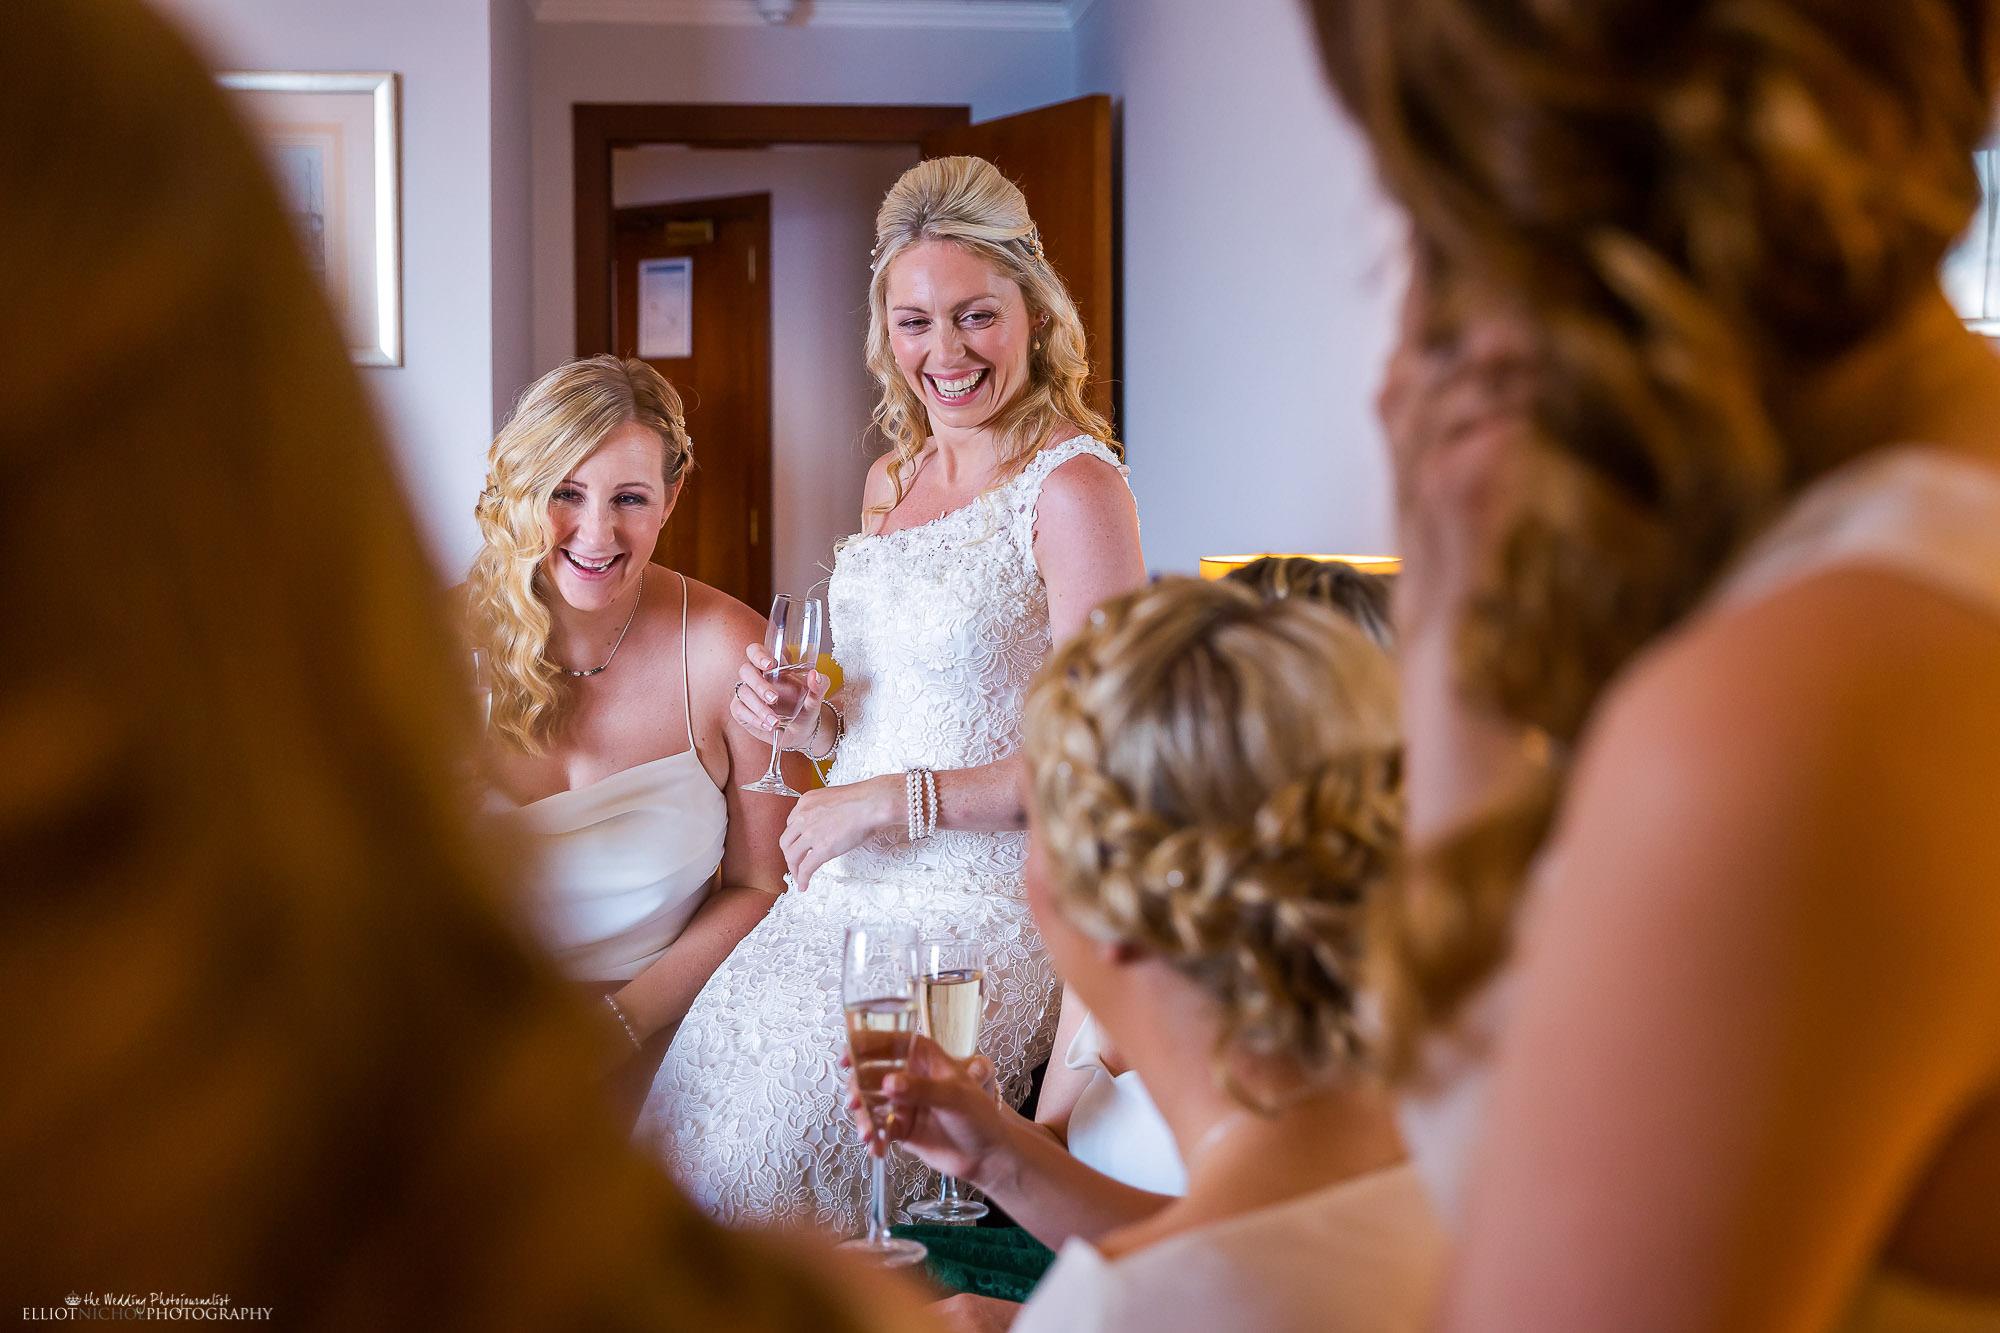 bride-laughing-laugh-bridesmaids-wedding-weddings-photography-photographer